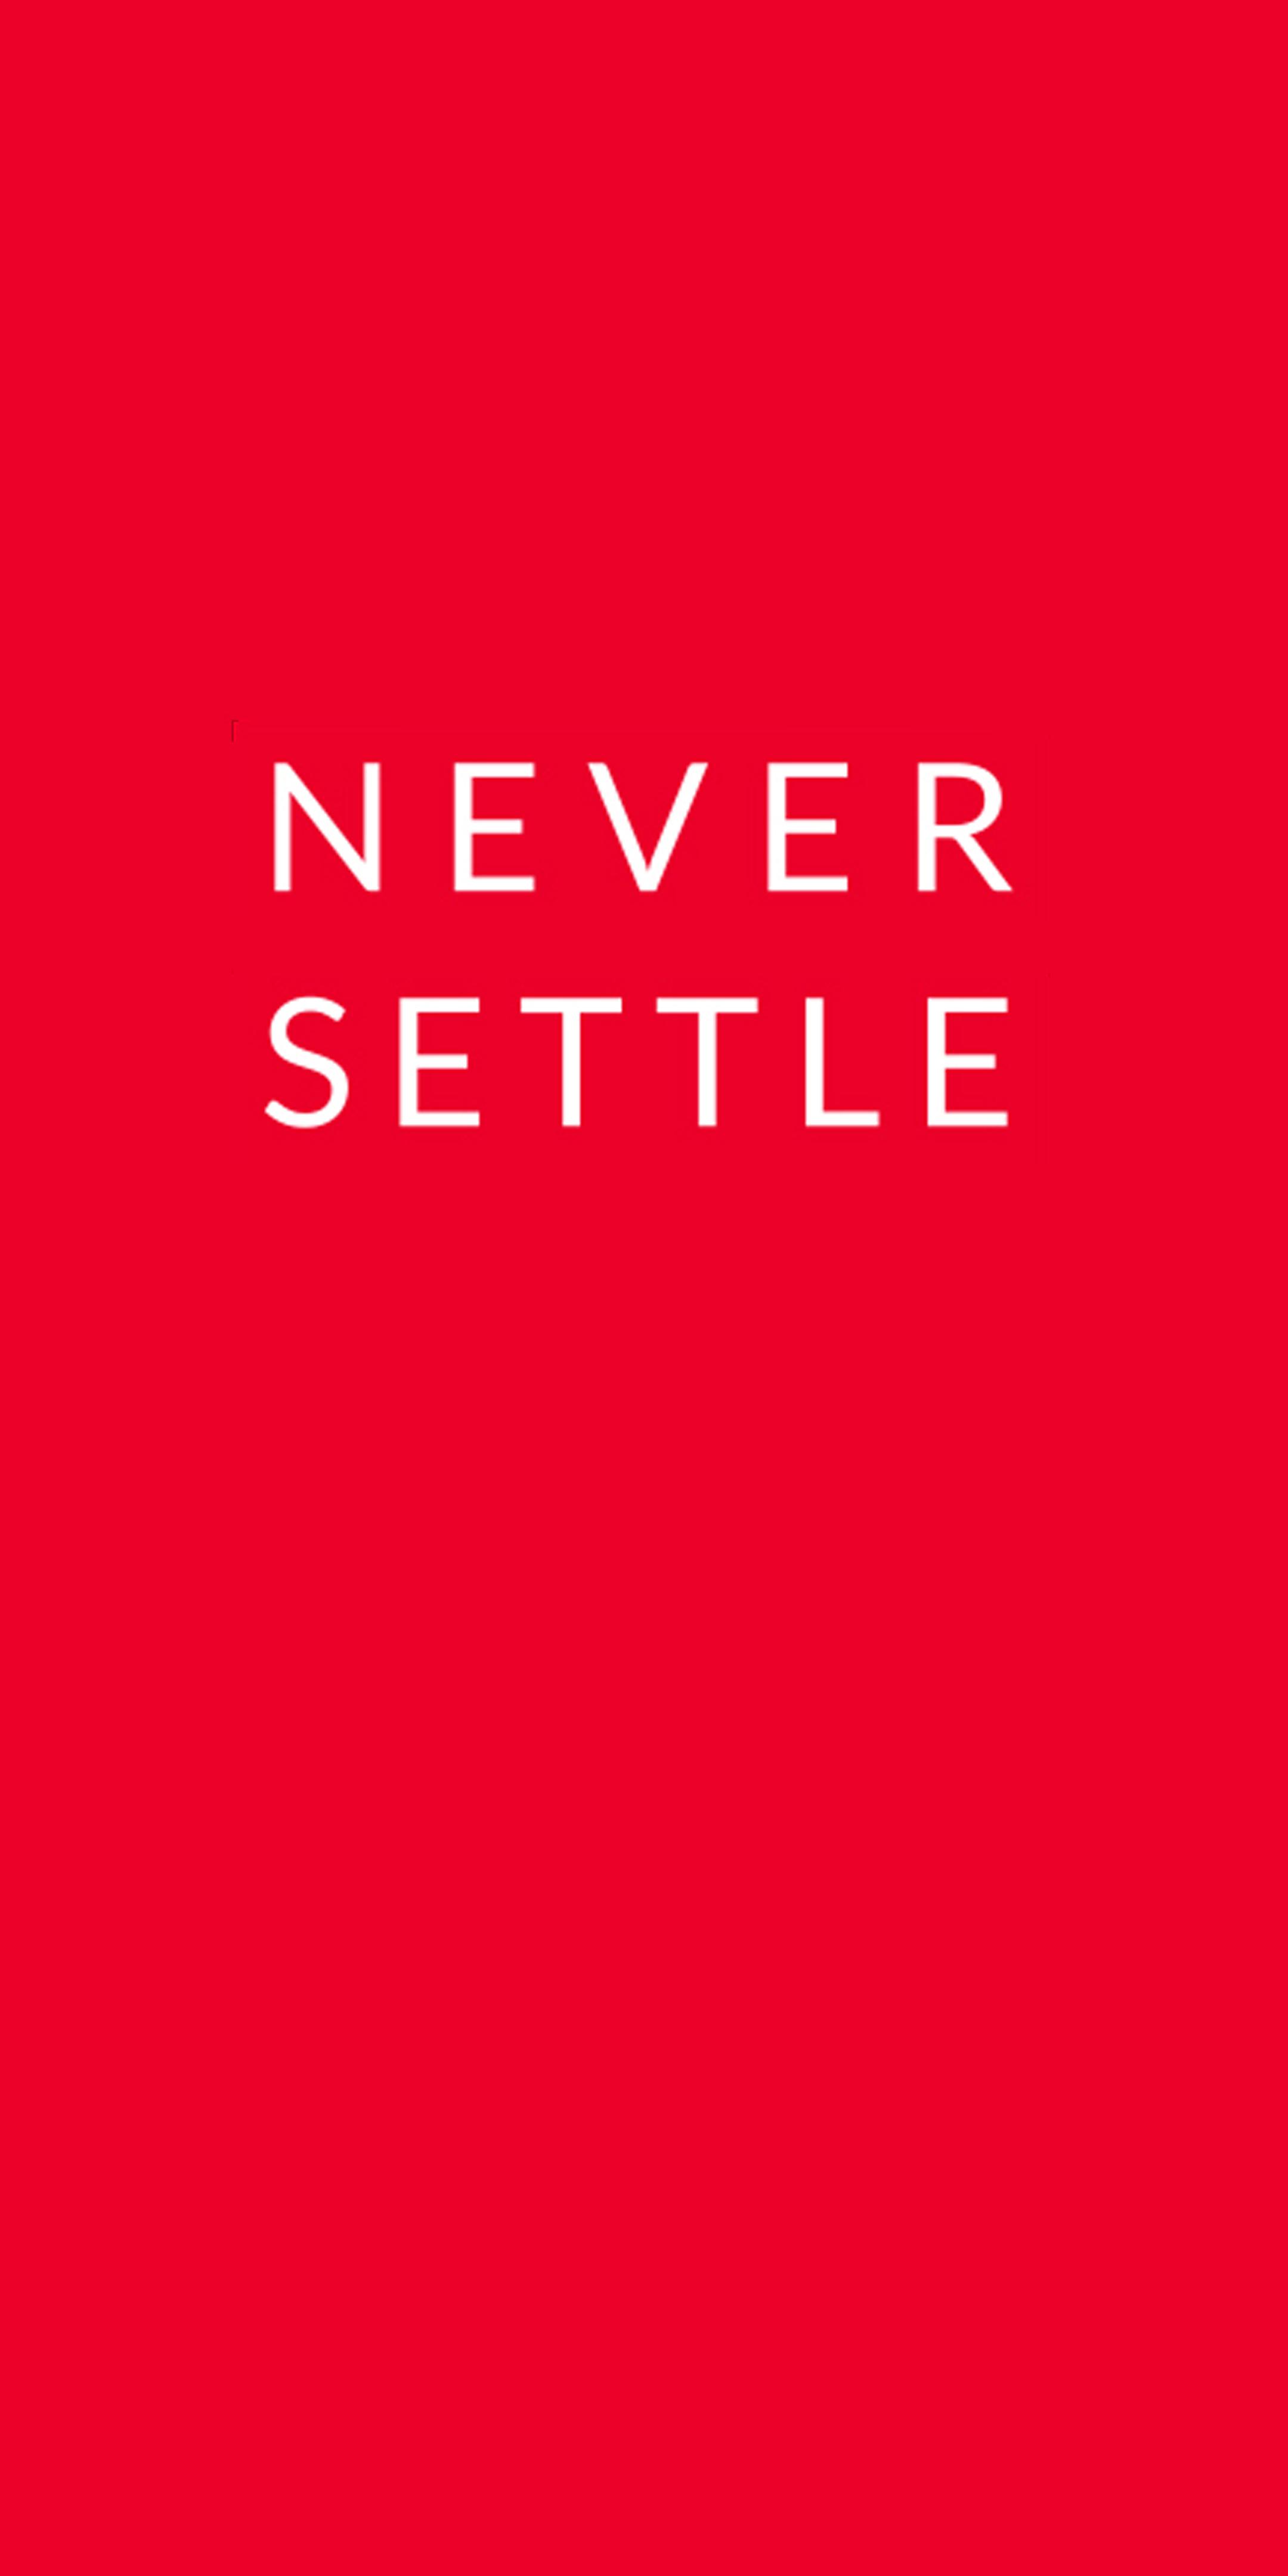 OnePlus _Red_Wallpapers_01.jpg